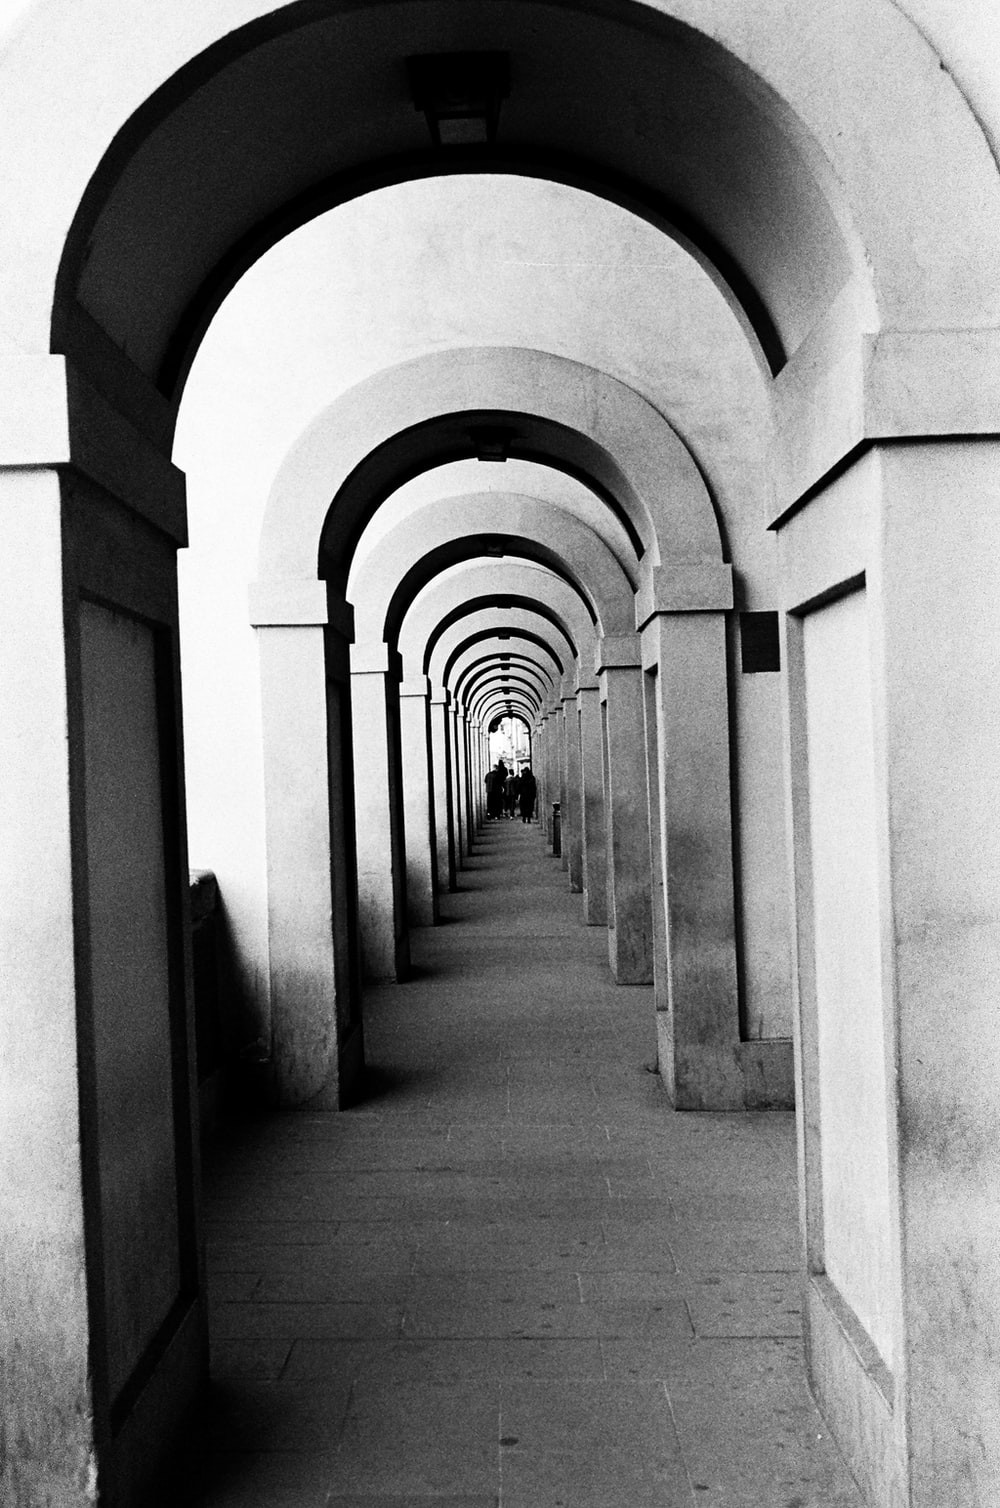 grayscale photography of hallway